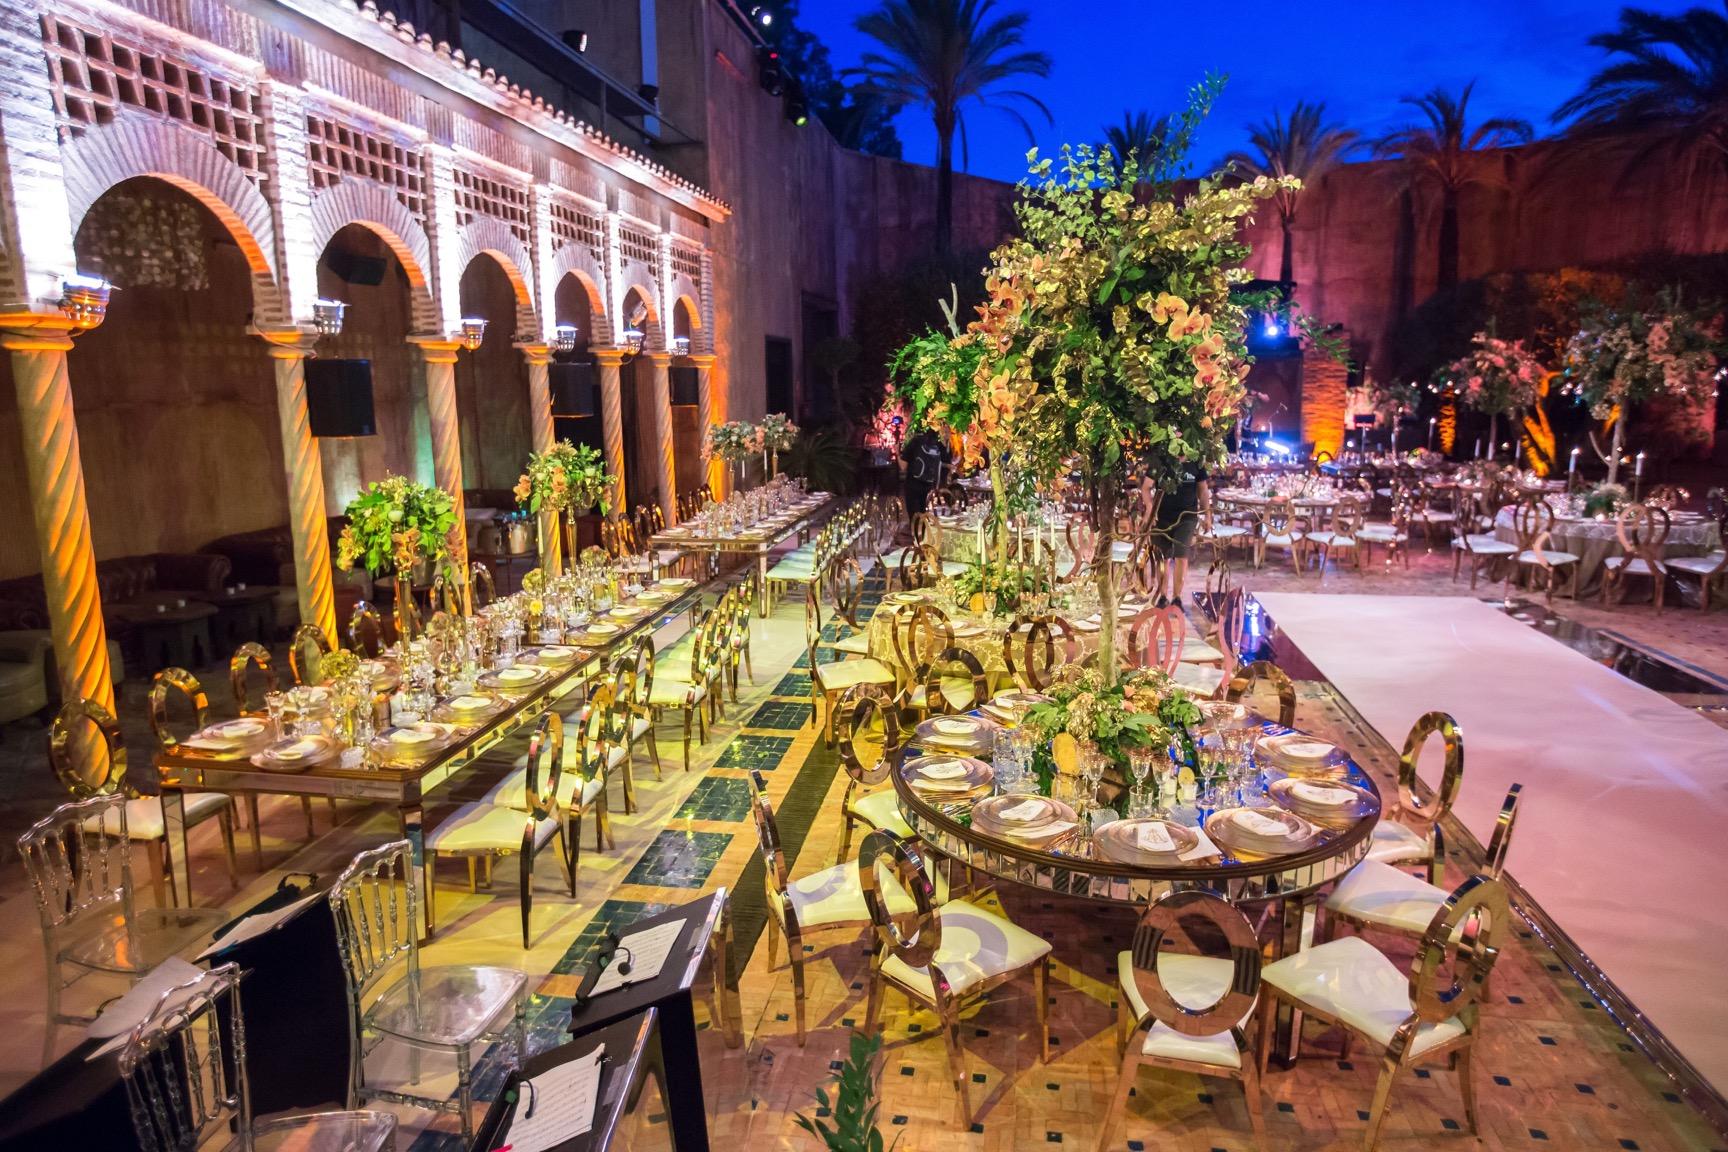 Si-Quiero-Wedding-Planner-By-Sira-Antequera-Bodas-Málaga-Marbella-Miami- L-A-54